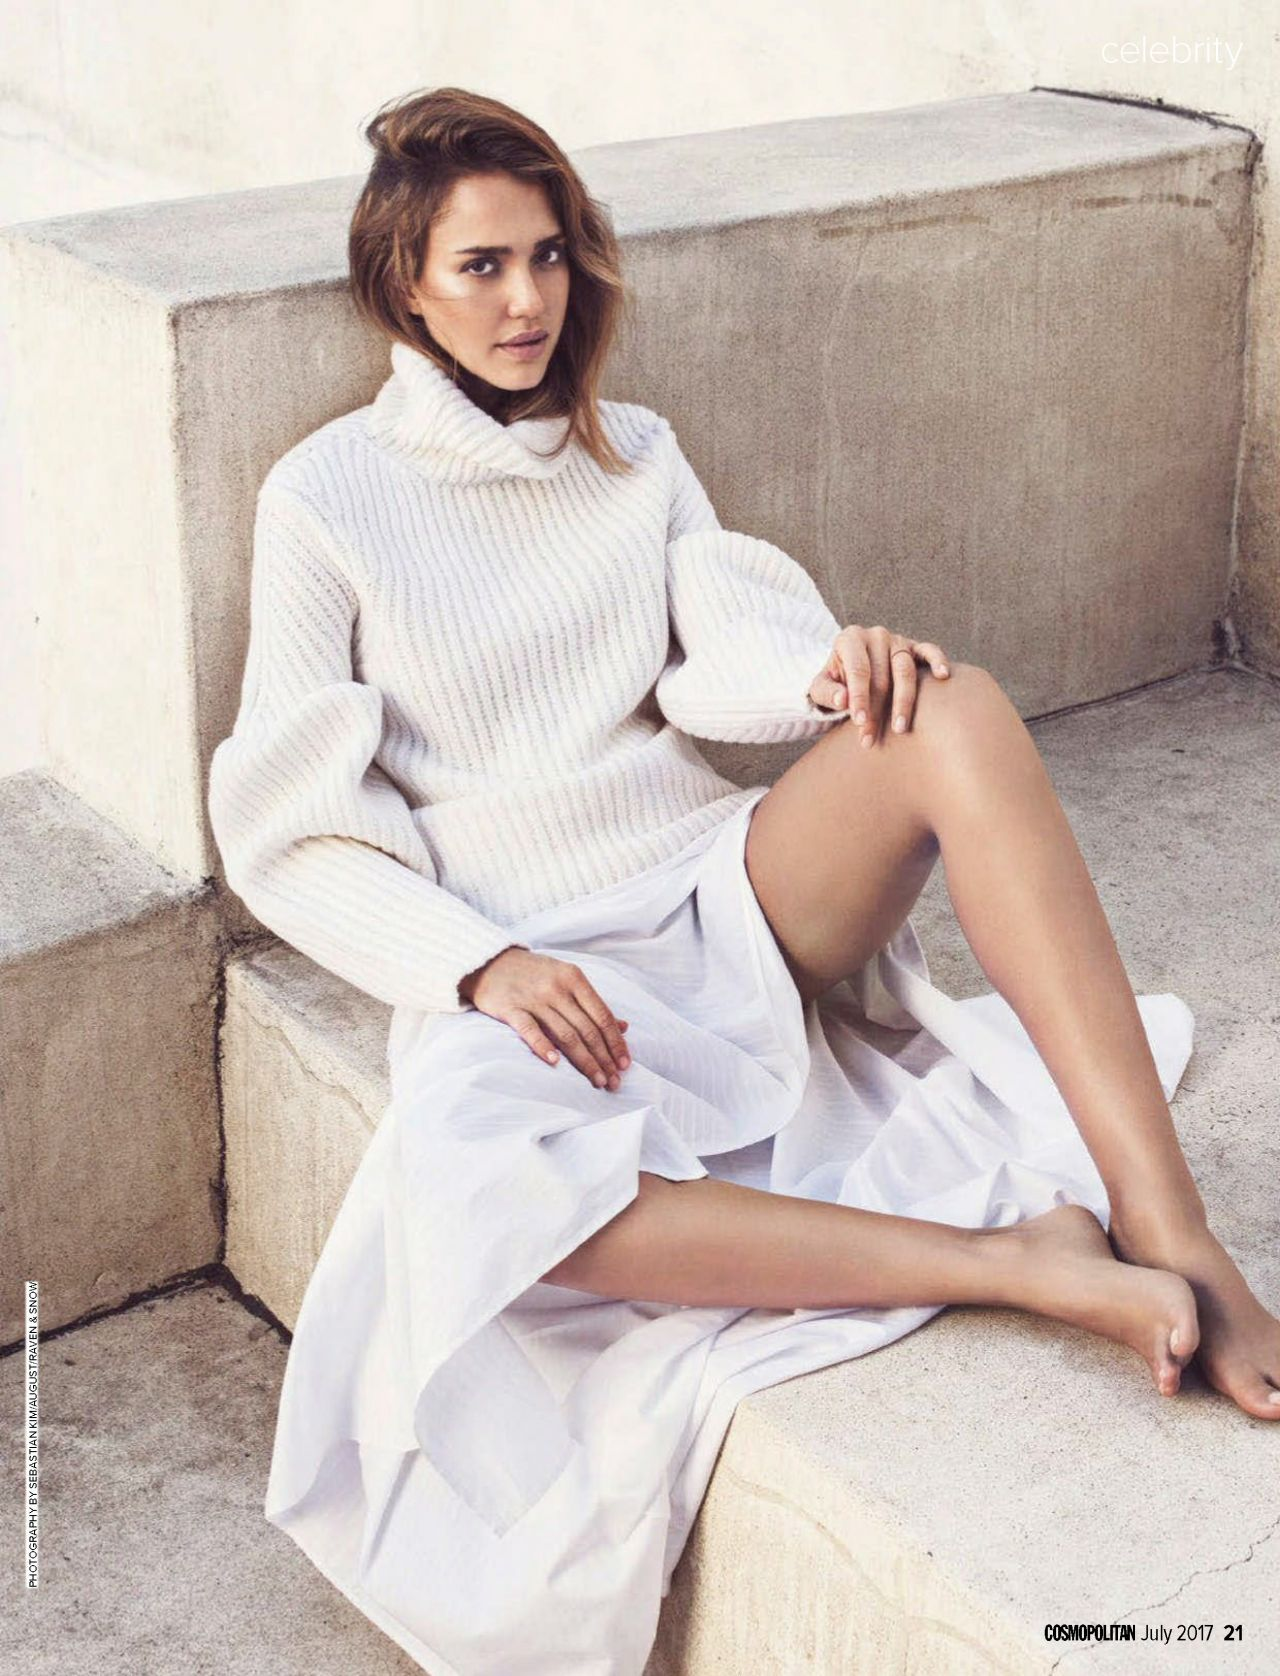 http://celebmafia.com/wp-content/uploads/2017/06/jessica-alba-cosmopolitan-australia-july-2017-issue-4.jpg